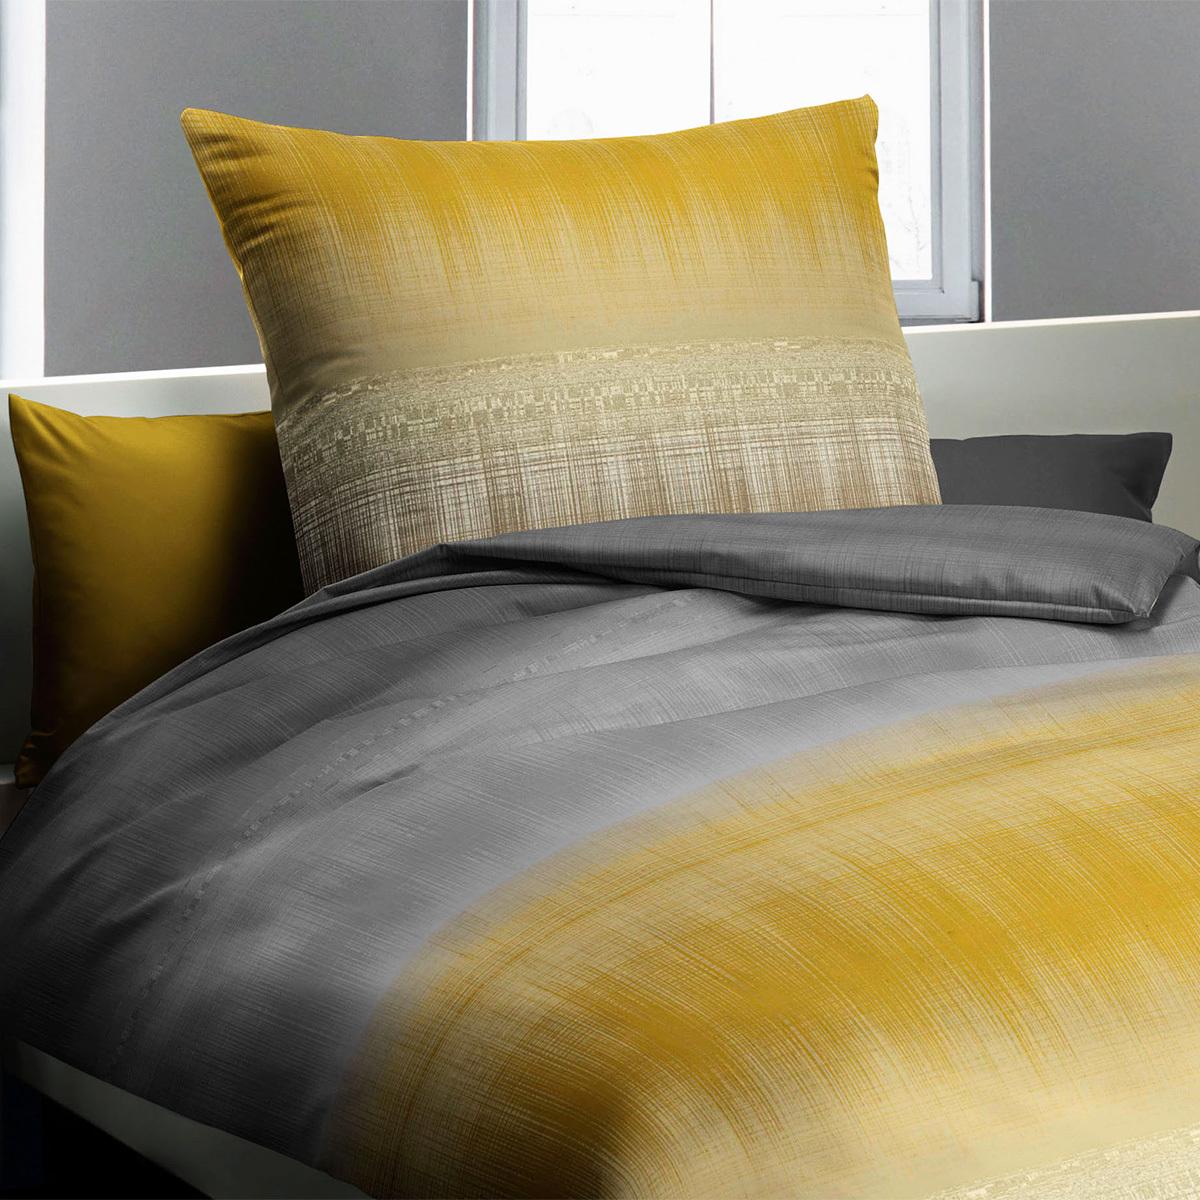 fleuresse feinbiber bettw sche 133346 g nstig online kaufen bei bettwaren shop. Black Bedroom Furniture Sets. Home Design Ideas